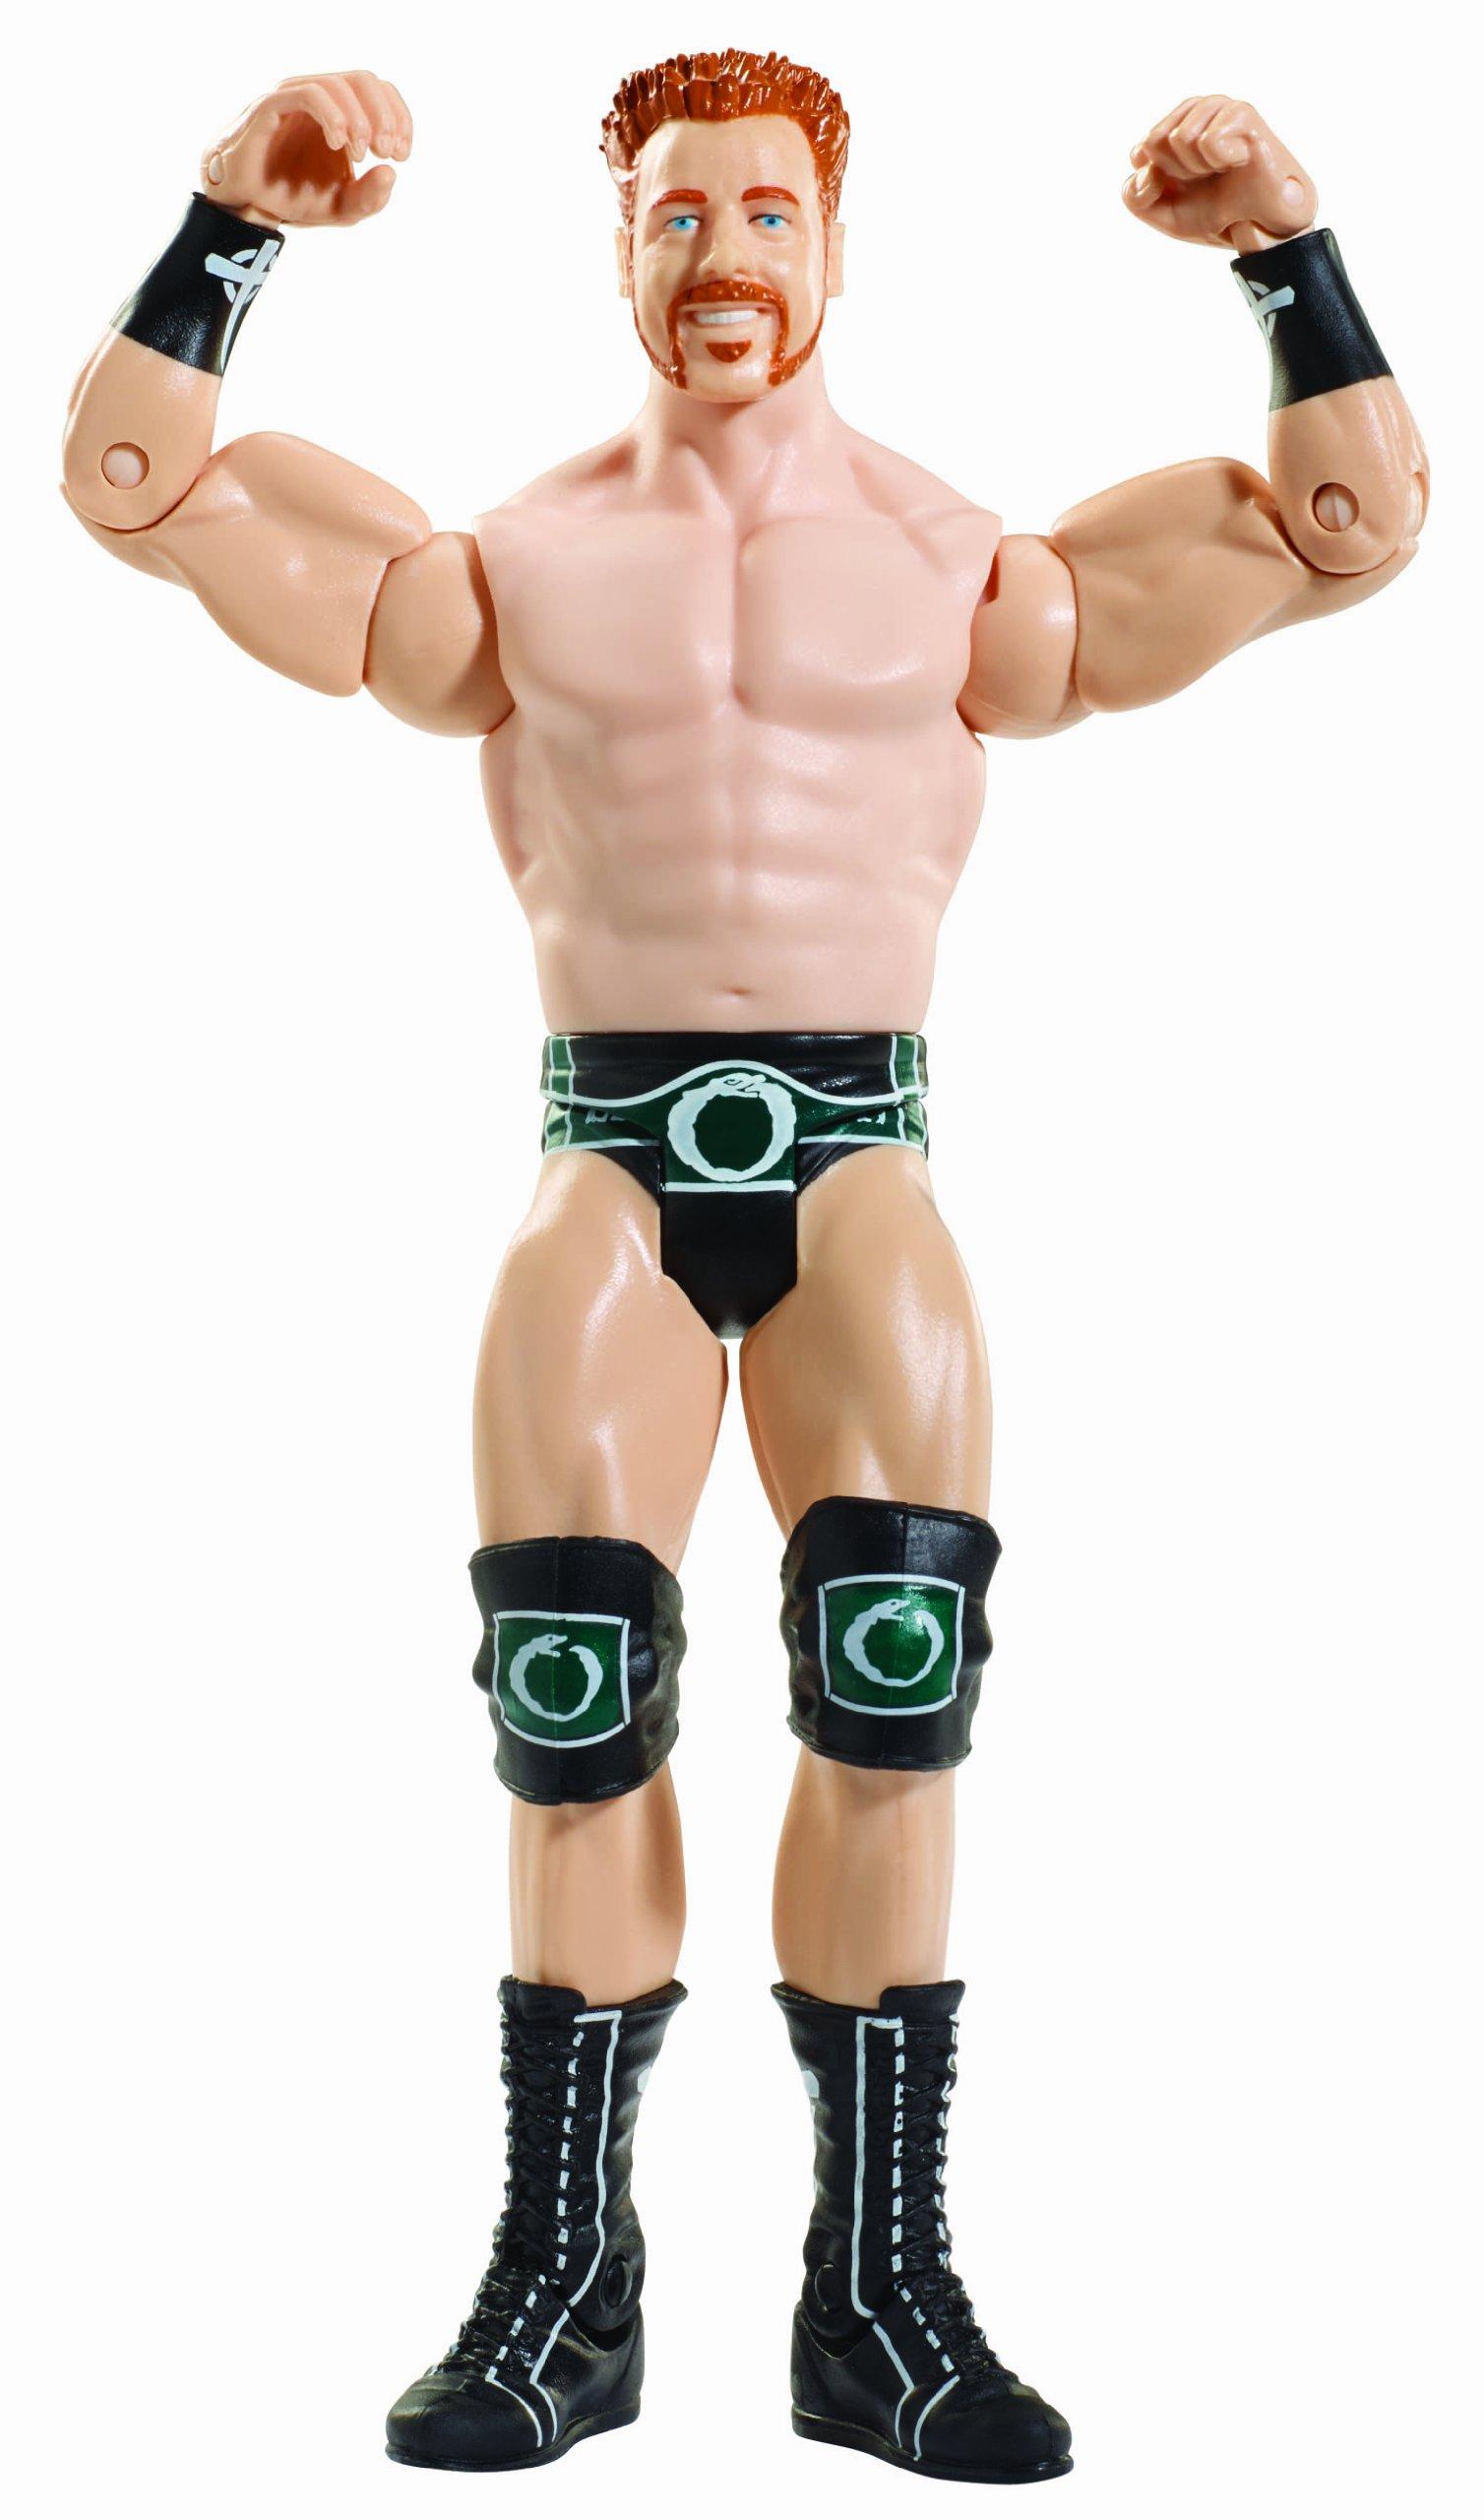 WWE Series #34 Superstar Sheamus Figure by WWE